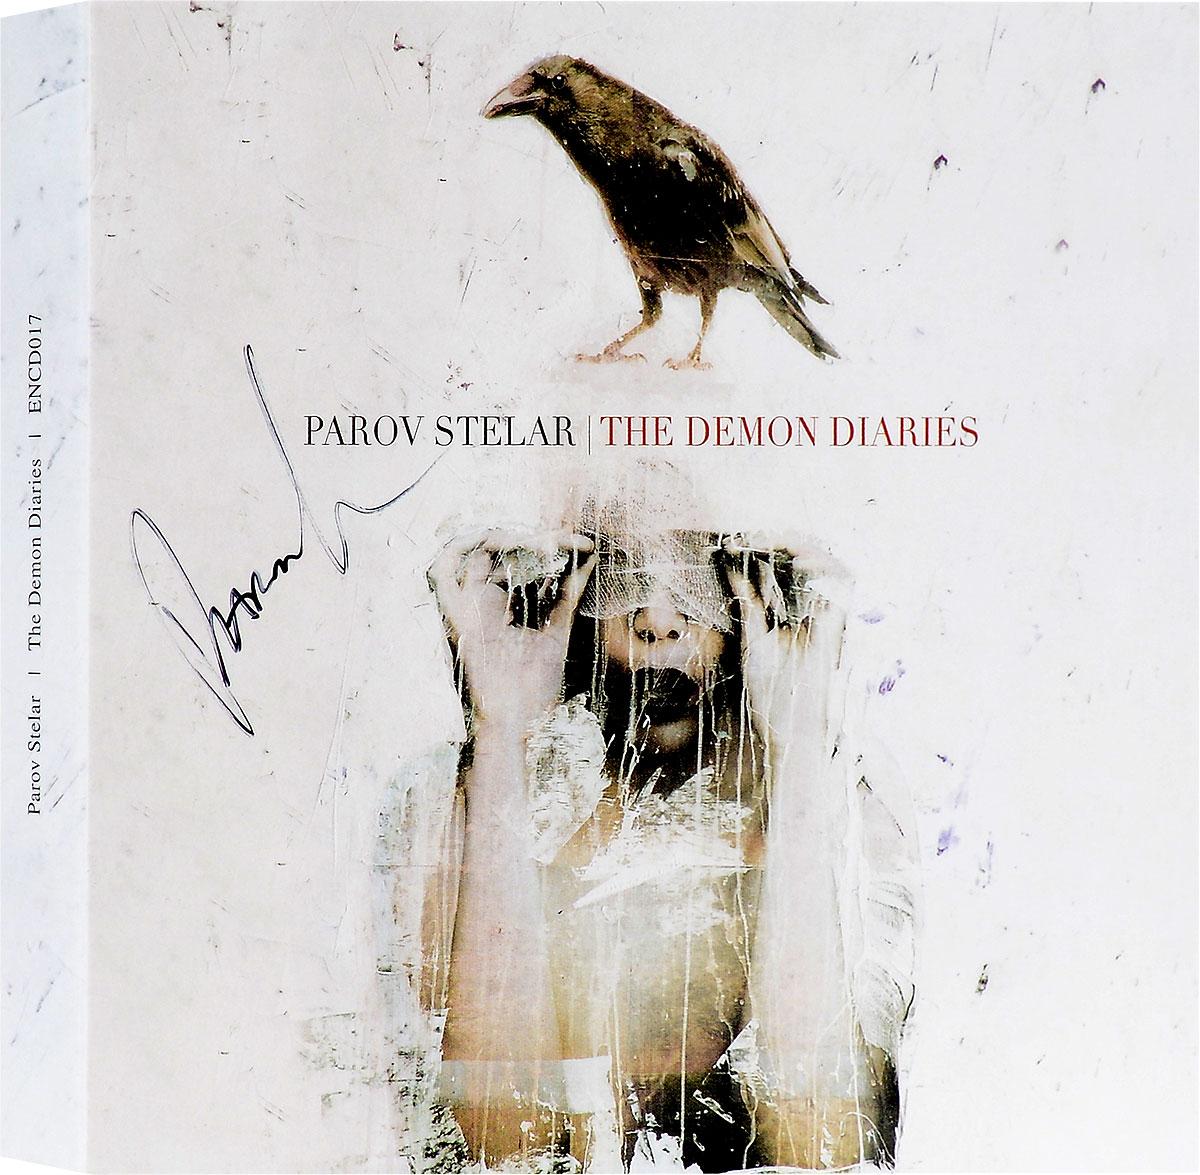 лучшая цена Parov Stelar Parov Stelar. The Demon Diaries. С автографом (2 CD)